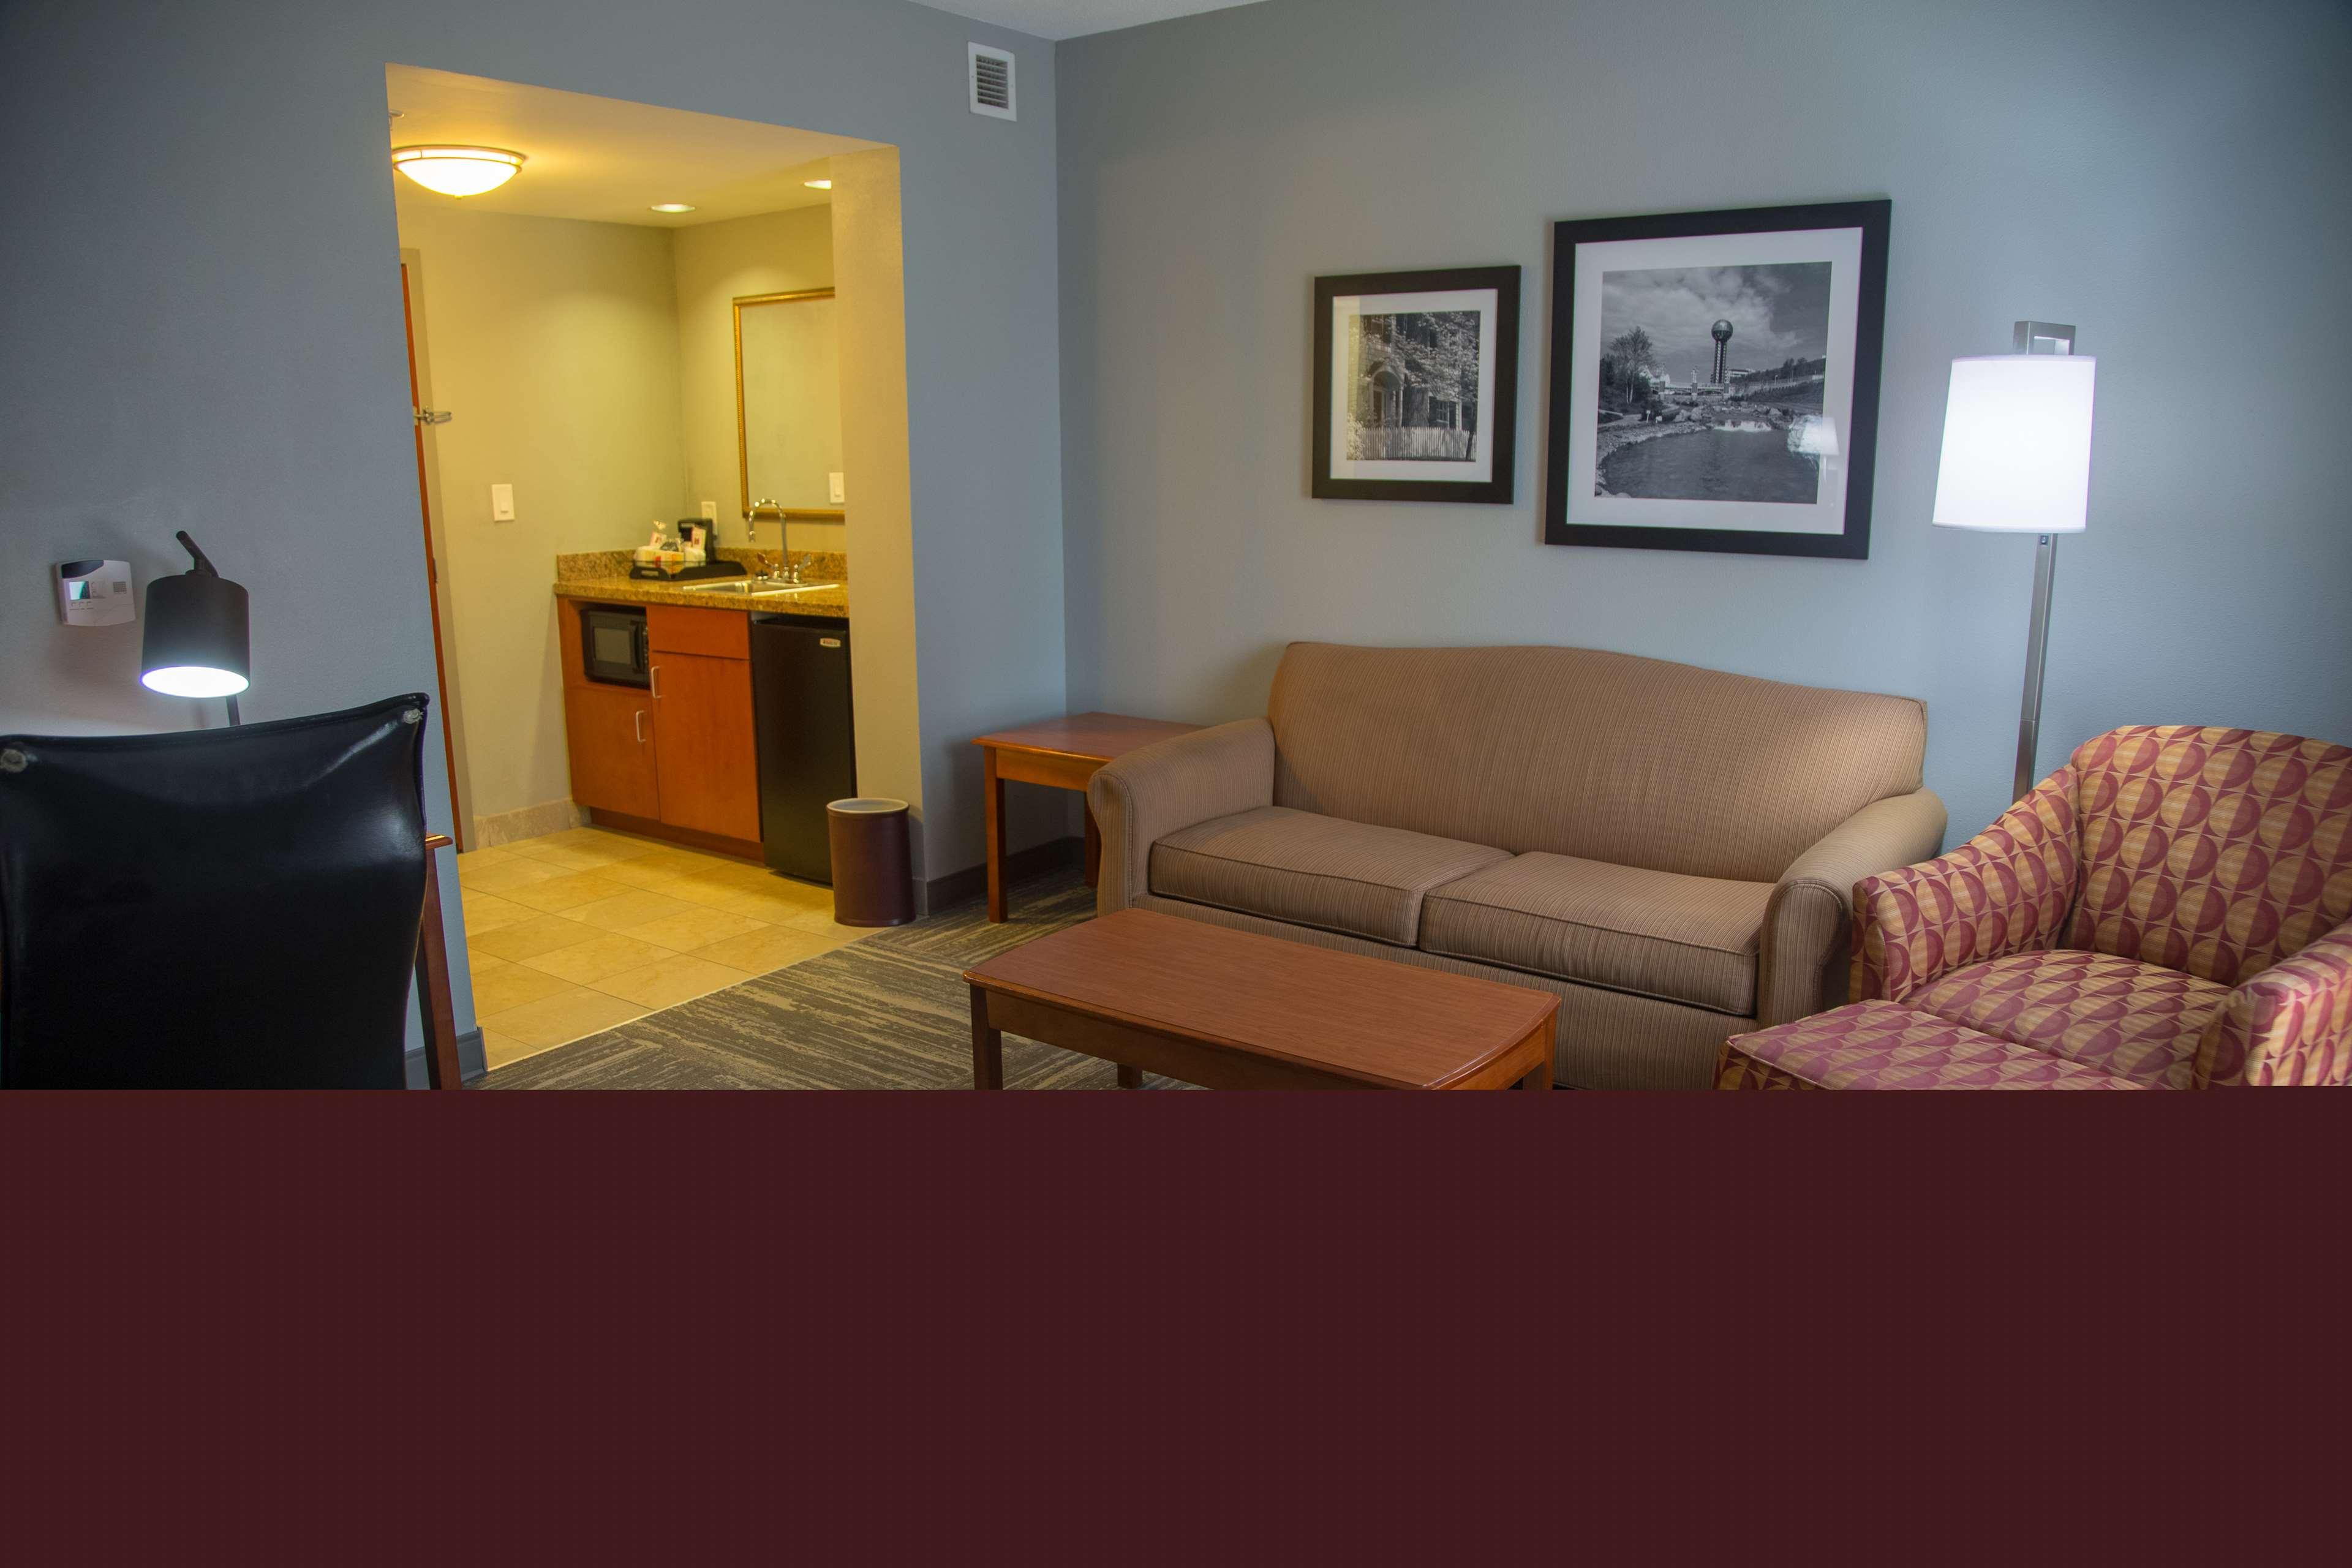 Hampton Inn & Suites Knoxville-Downtown image 1